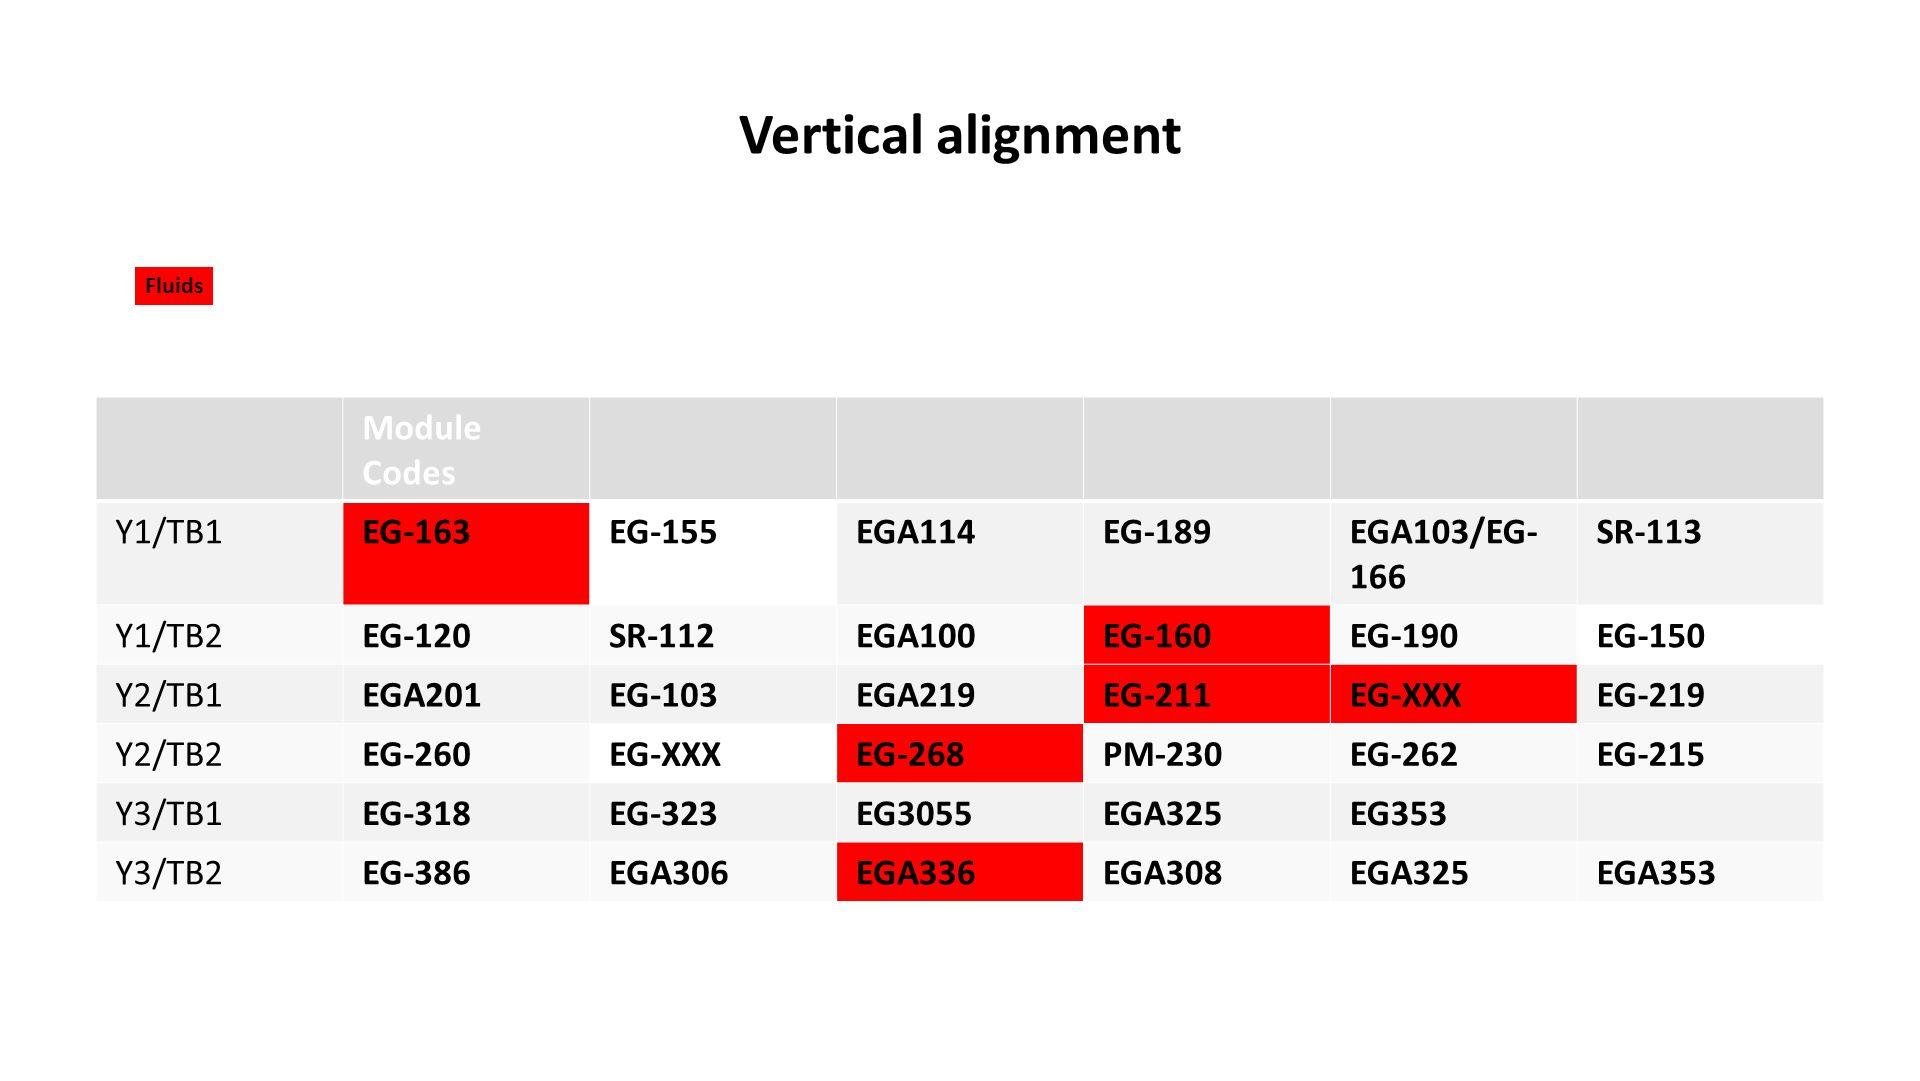 Vertical alignment Module Codes Y1/TB1EG-163EG-155EGA114EG-189EGA103/EG- 166 SR-113 Y1/TB2EG-120SR-112EGA100EG-160EG-190EG-150 Y2/TB1EGA201EG-103EGA219EG-211EG-XXXEG-219 Y2/TB2EG-260EG-XXXEG-268PM-230EG-262EG-215 Y3/TB1EG-318EG-323EG3055EGA325EG353 Y3/TB2EG-386EGA306EGA336EGA308EGA325EGA353 Fluids